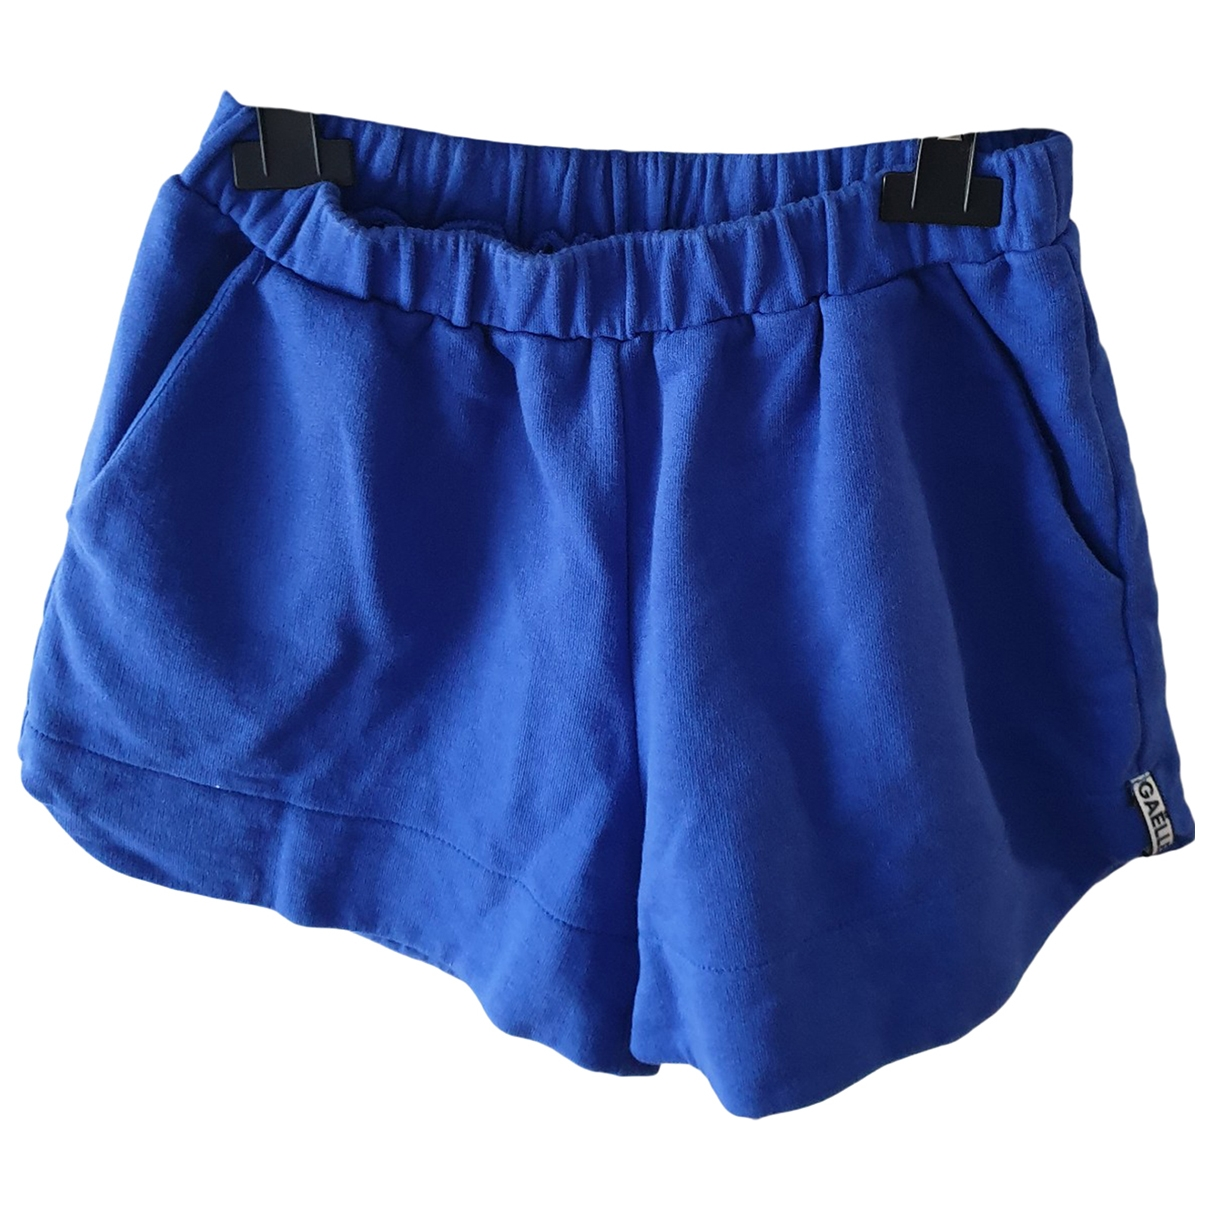 Gaelle Paris \N Blue Cotton Shorts for Kids 14 years - S FR